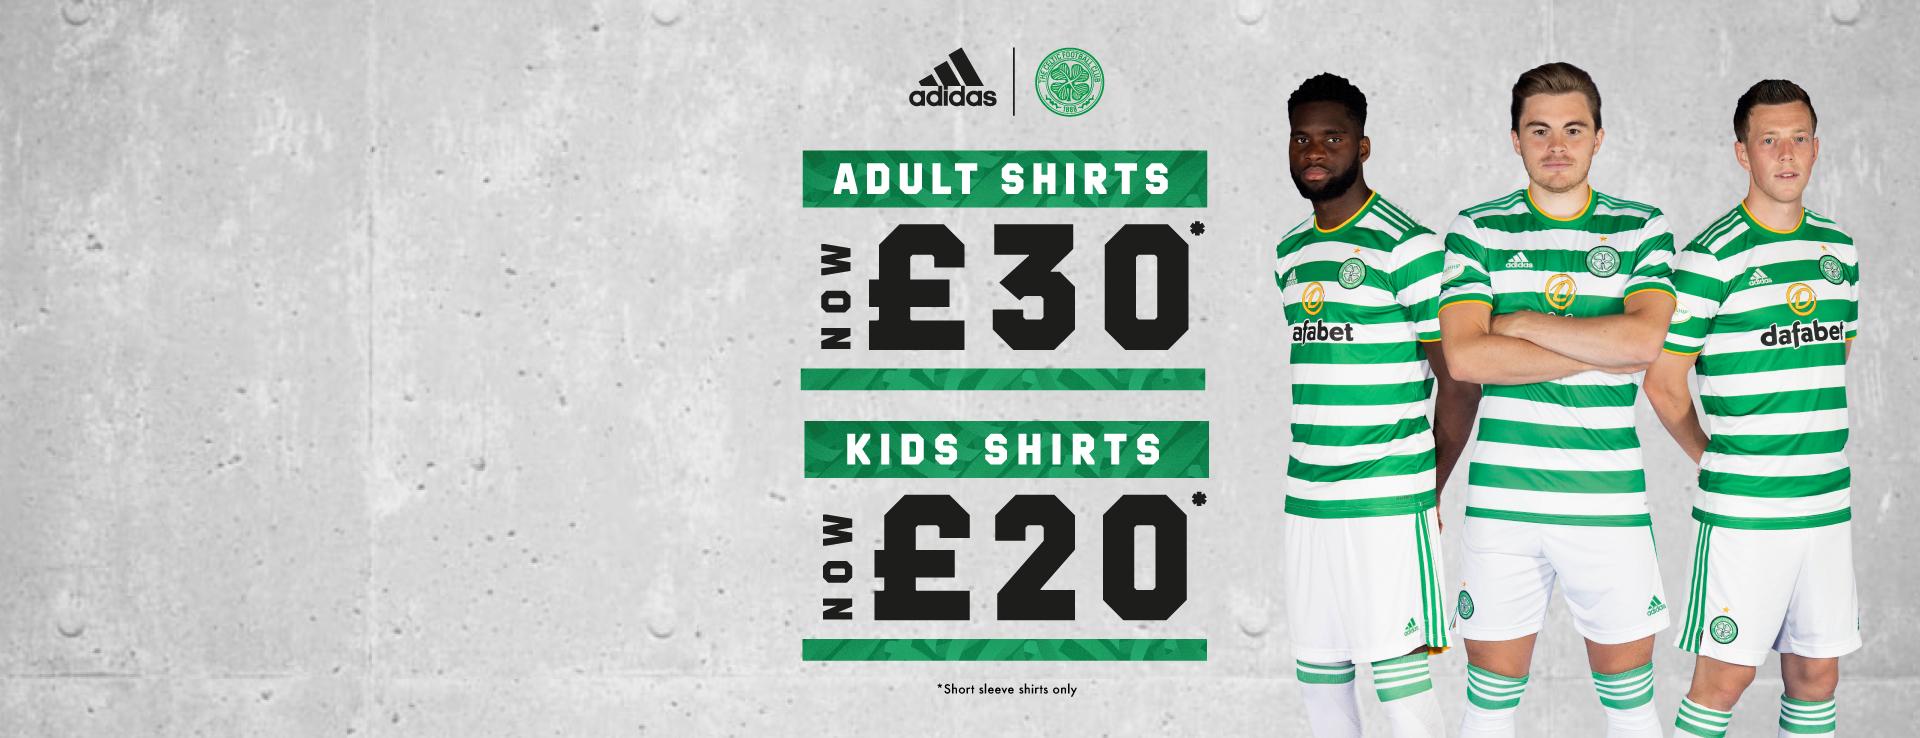 Celtic FC 2020/21 Home Kit Reductions